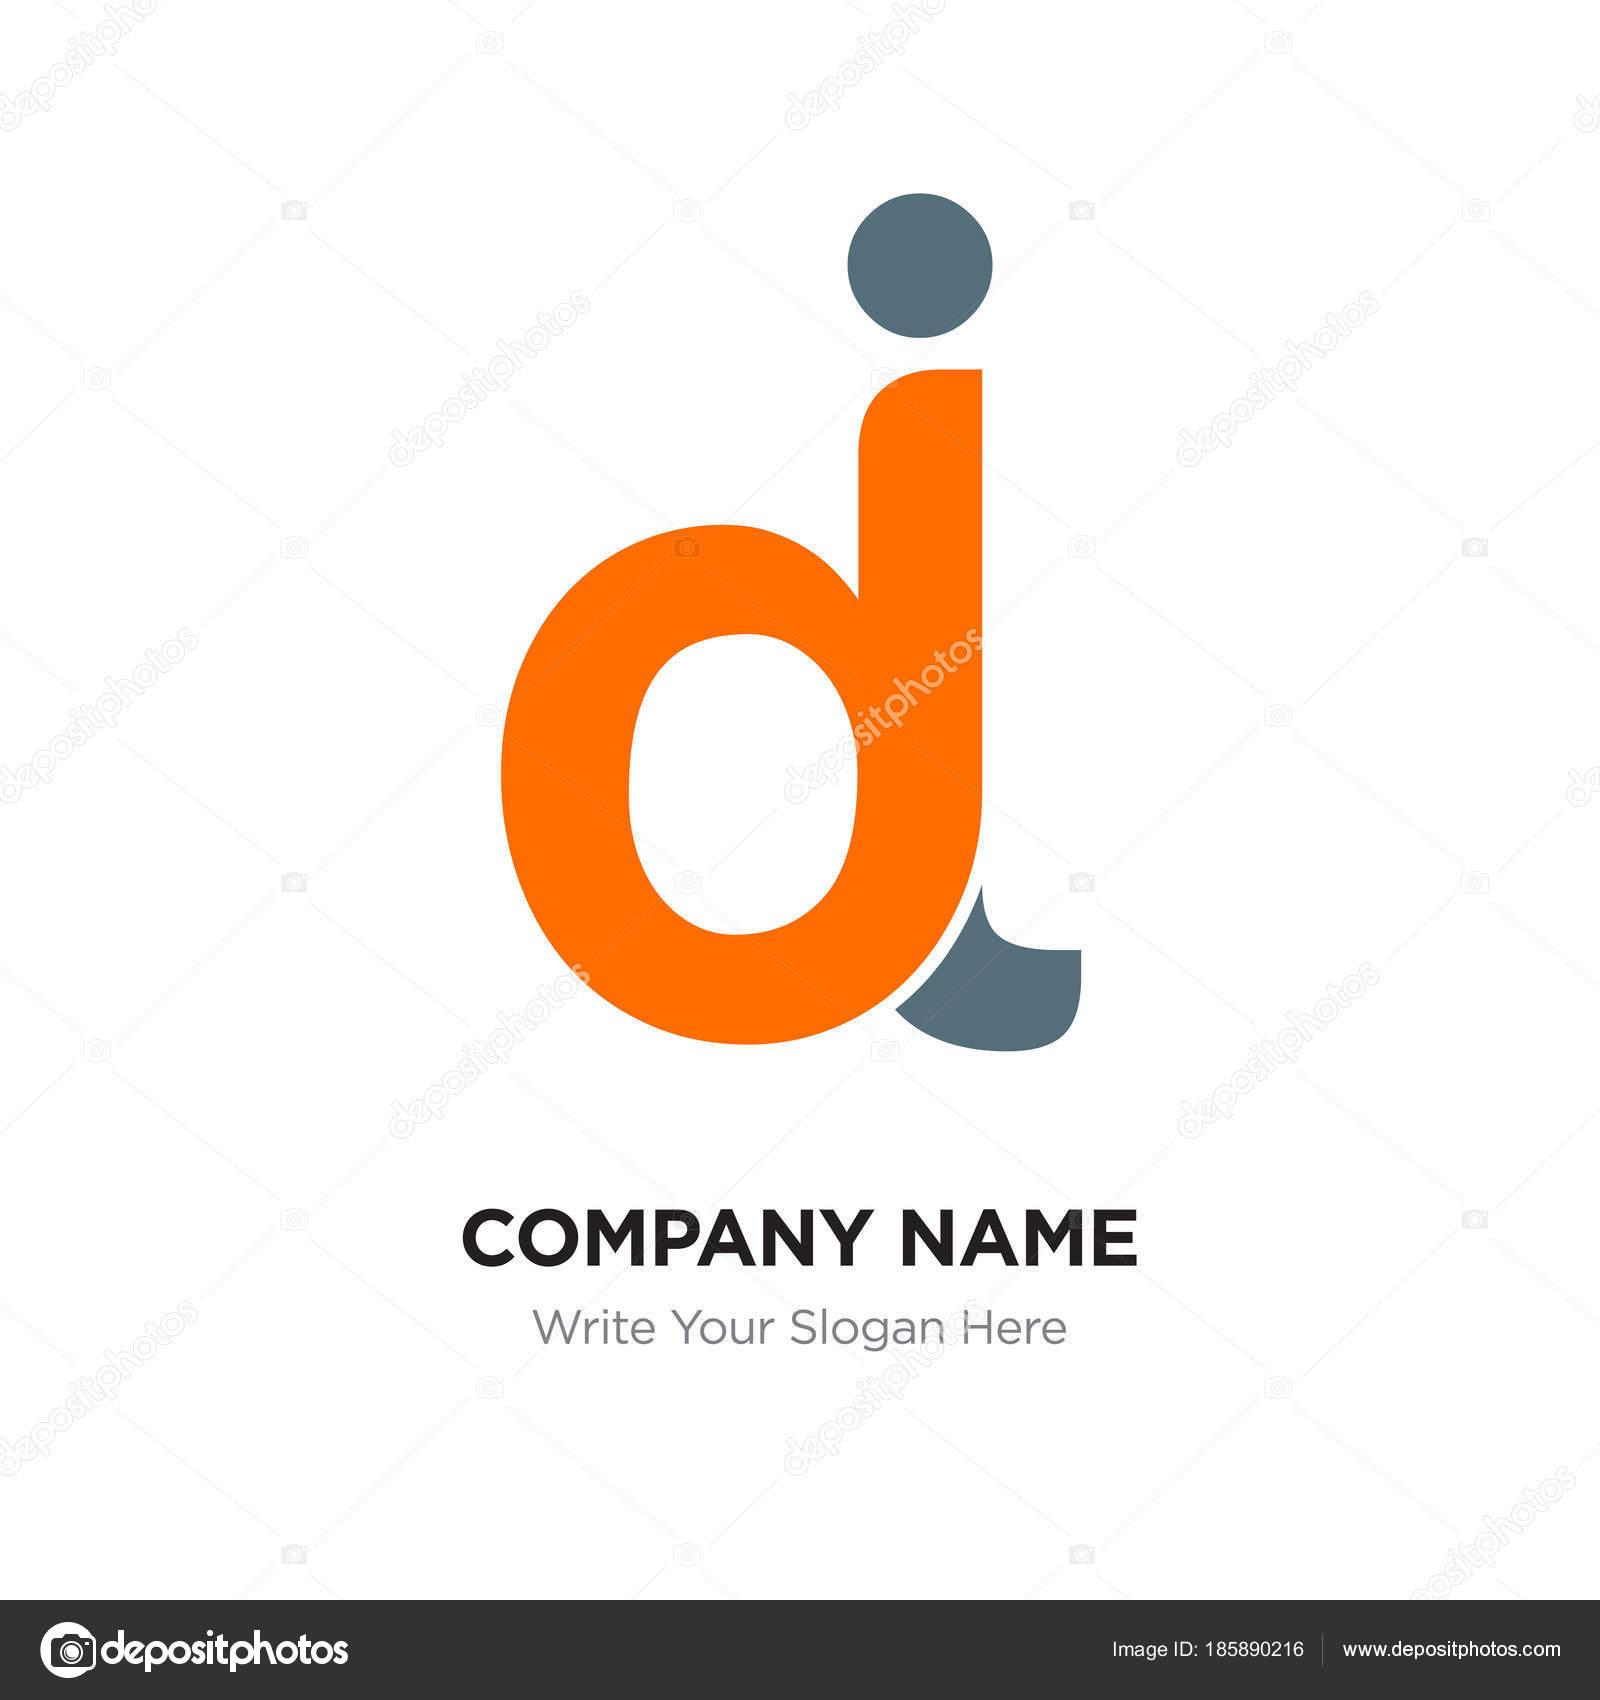 abstract letter dj jd logo design template black orange alph stock vector c provectorstock 185890216 https depositphotos com 185890216 stock illustration abstract letter dj jd logo html